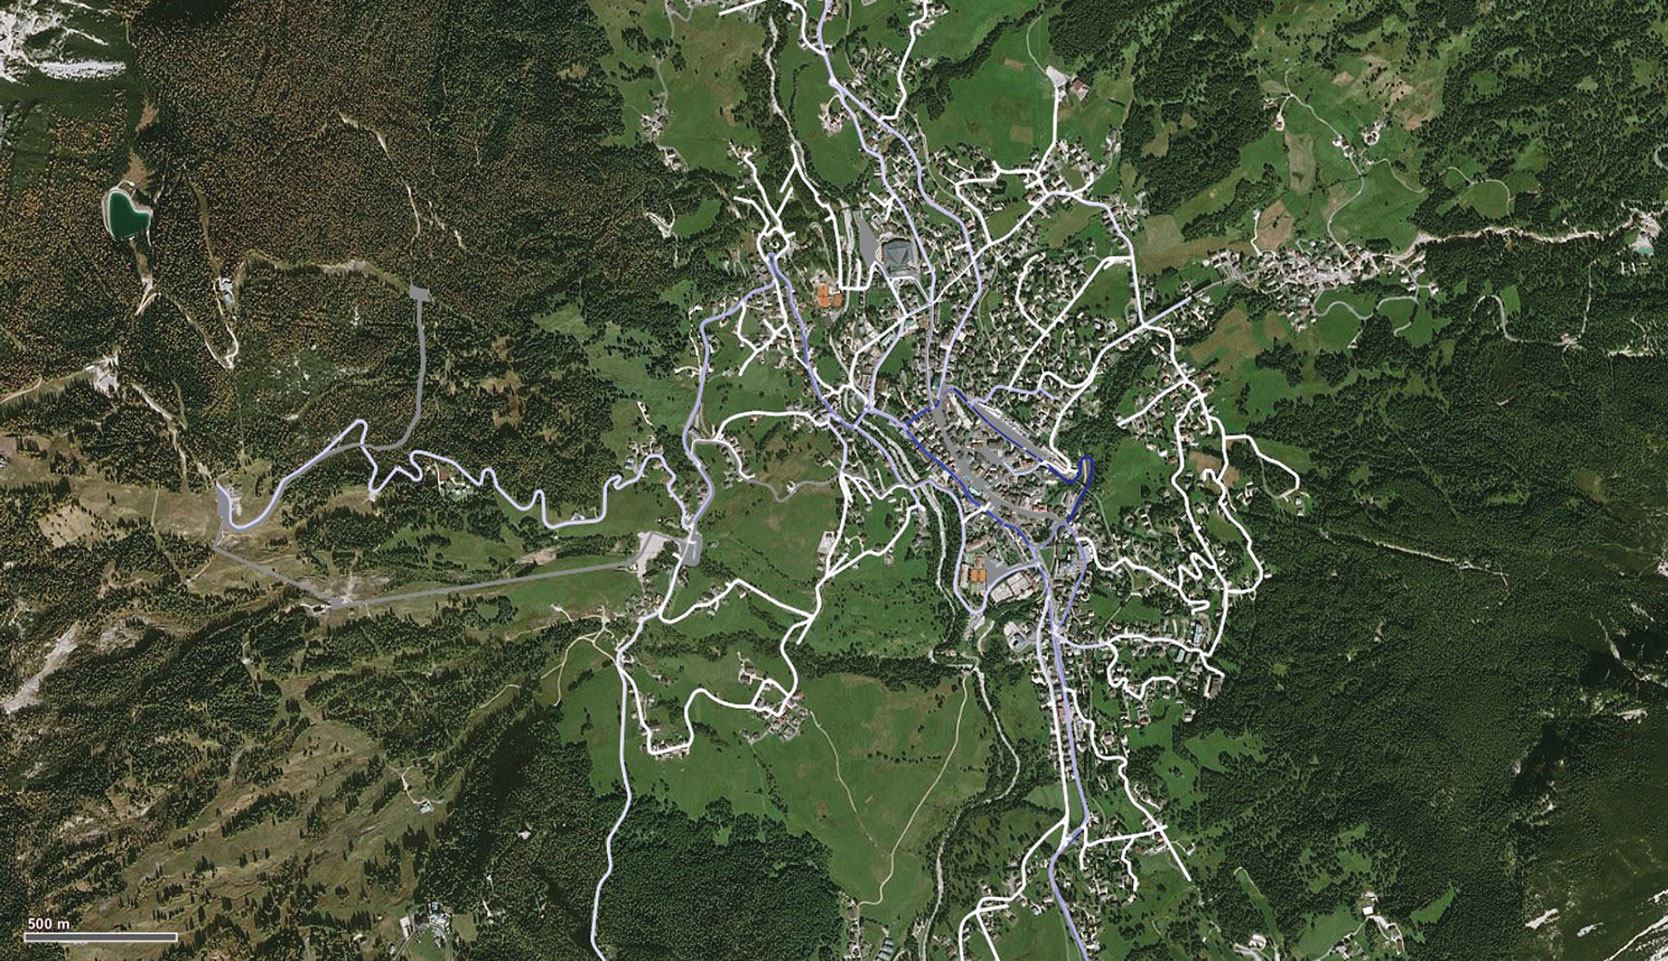 Alpine World Ski Championships Cortina 2021 Strategic Accessibility and Mobility Plan, Hourly Traffic Volume